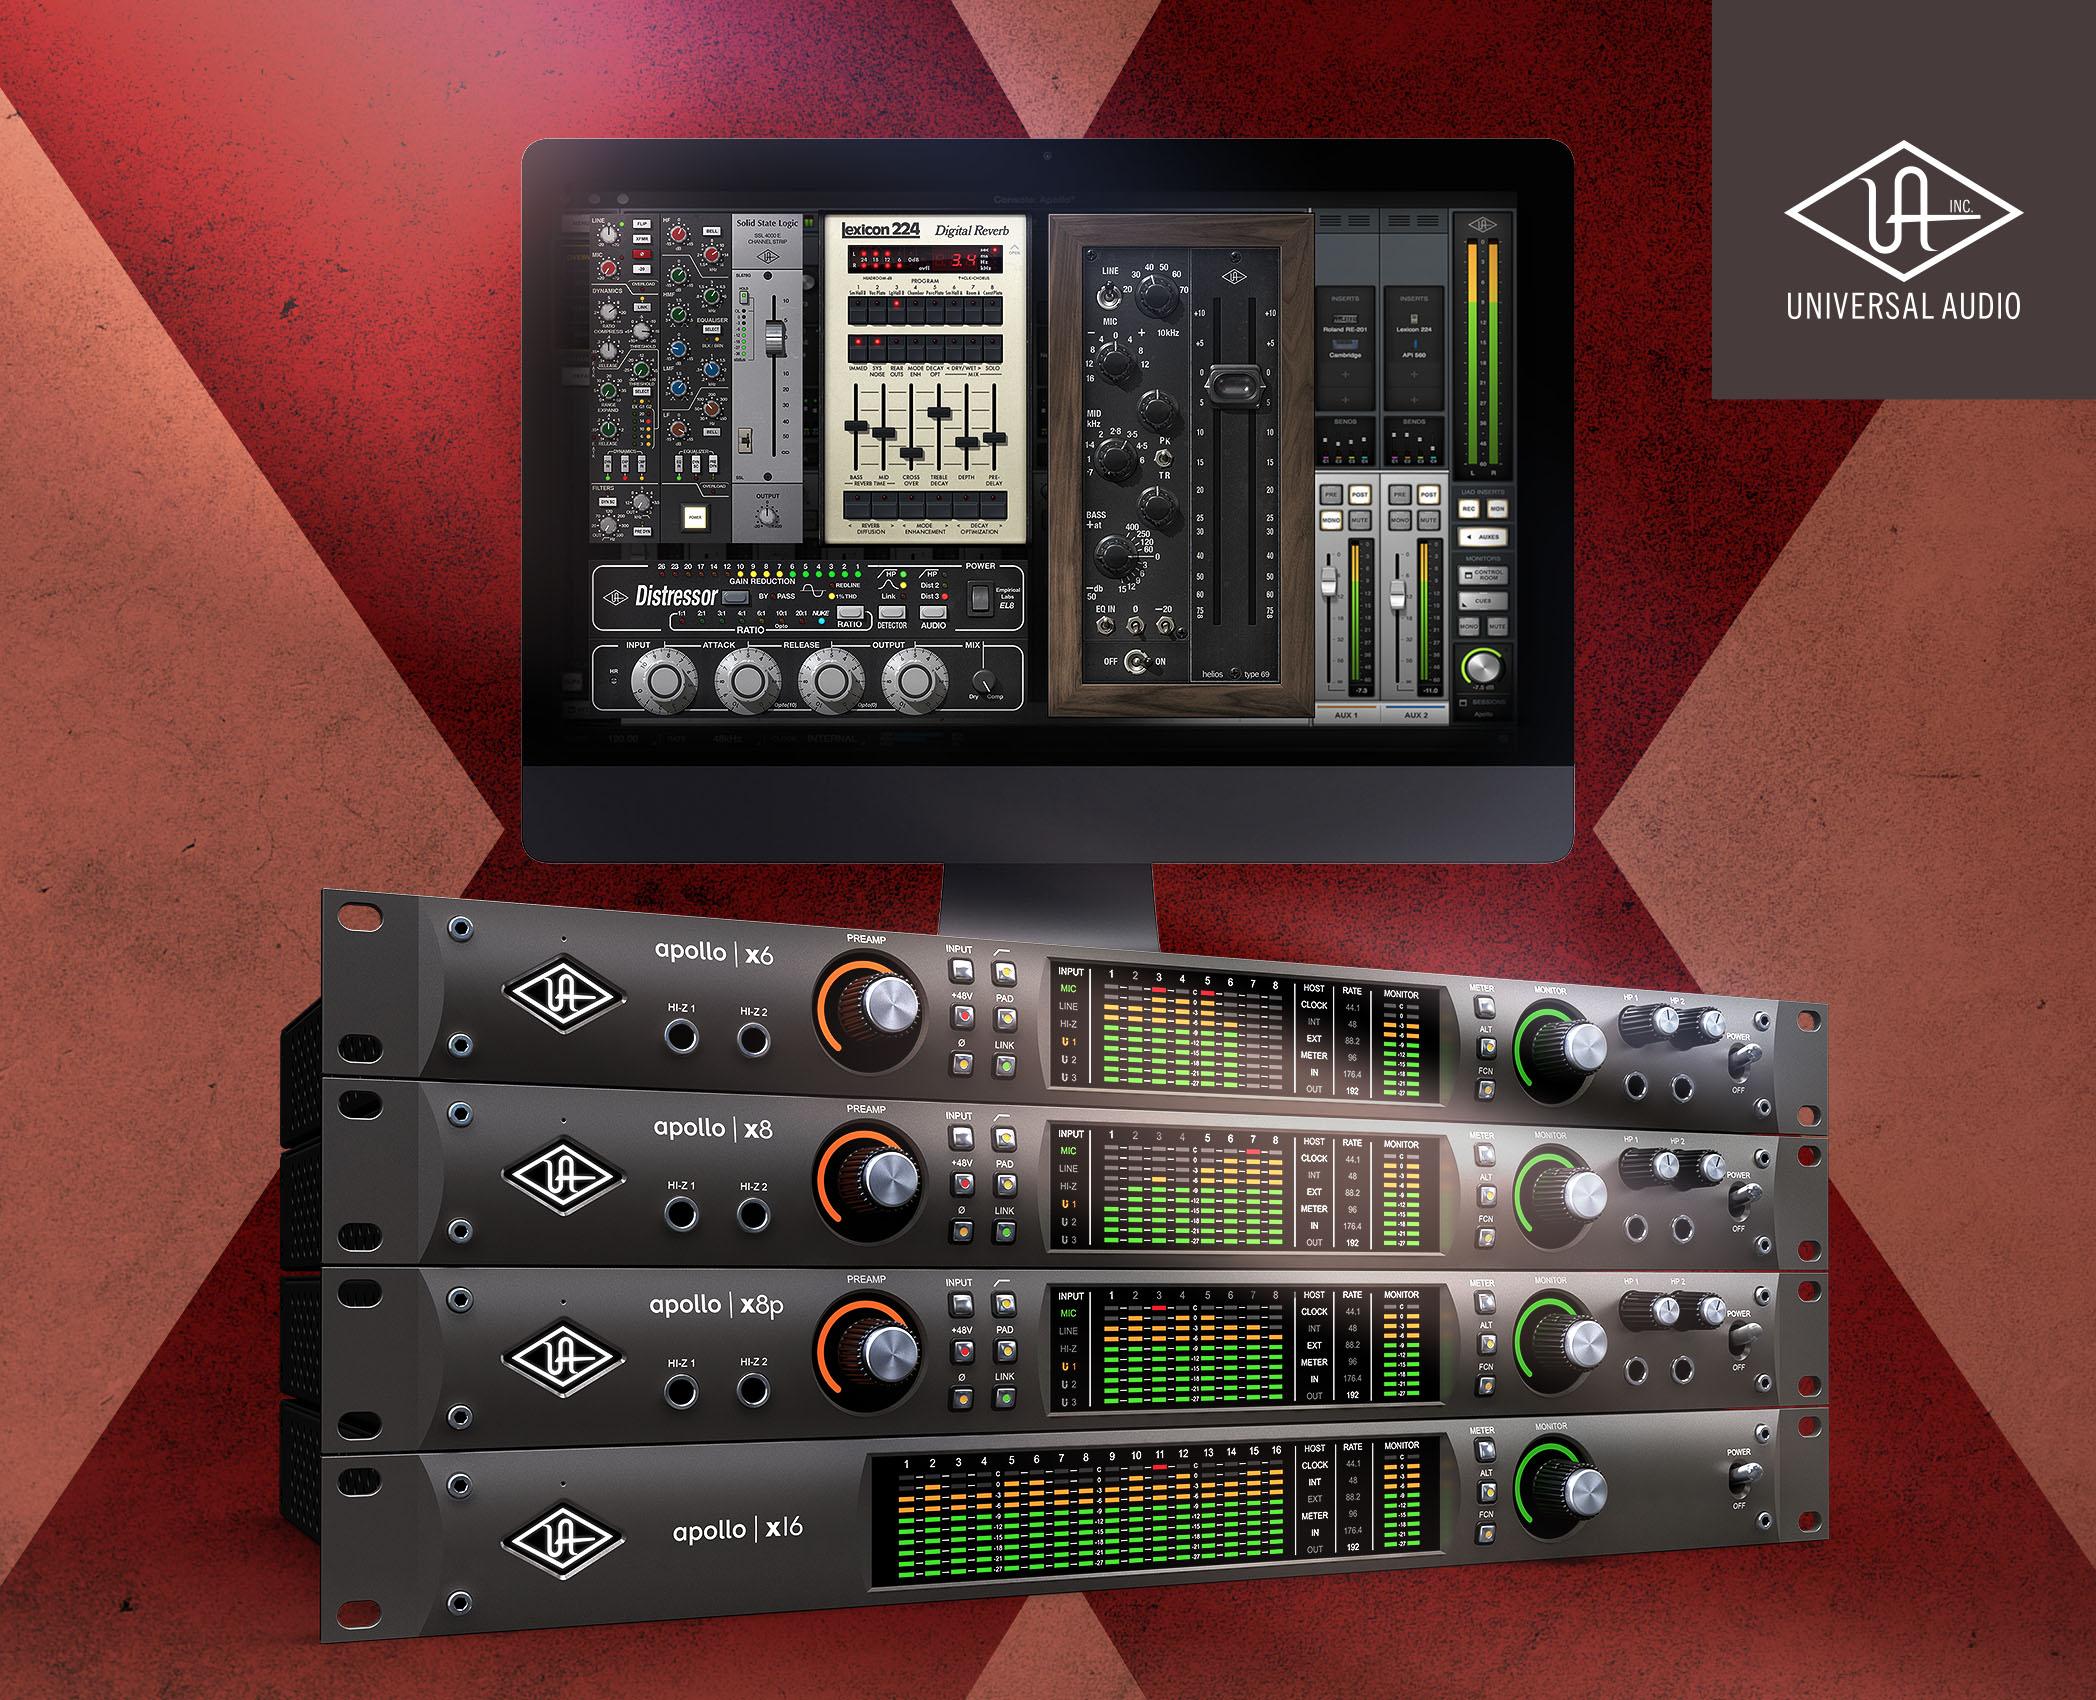 Universal Audio kampanj – Köp Apollo X och få gratis plug-ins från Helios, SSL, Lexicon m.fl.